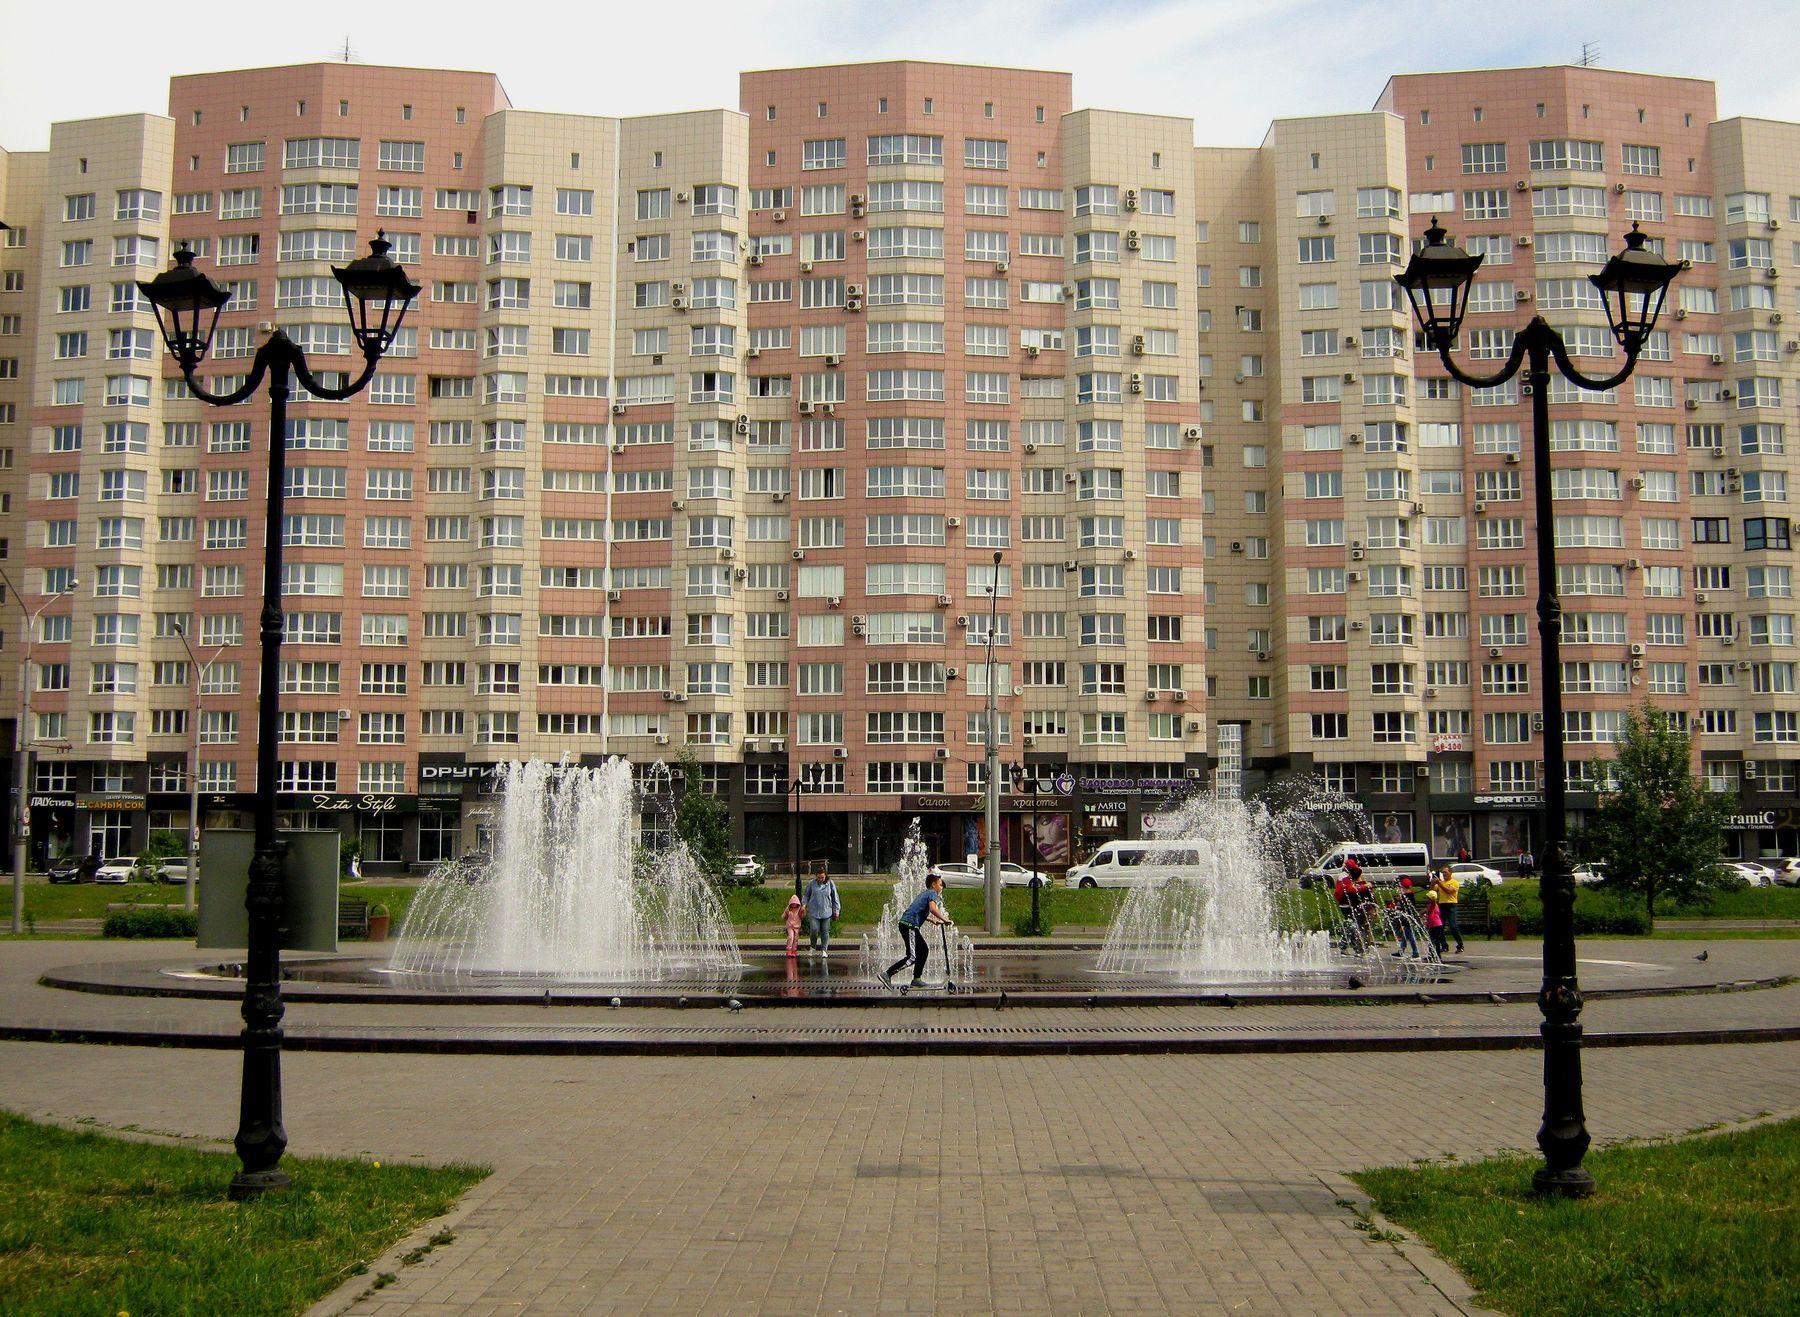 Сквер имени Ермакова. Путешествия жанр арт детский мир архитектура техно